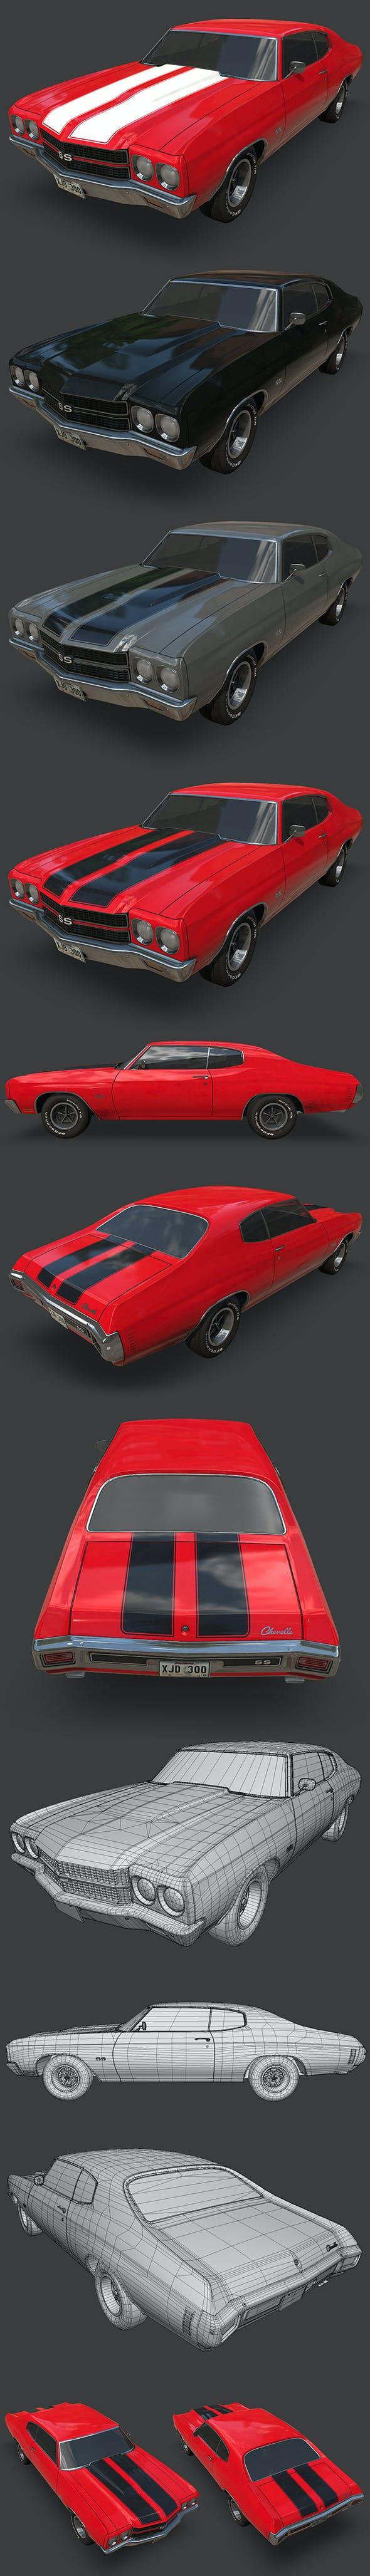 Chevrolet Chevelle 1970 - 3DOcean Item for Sale